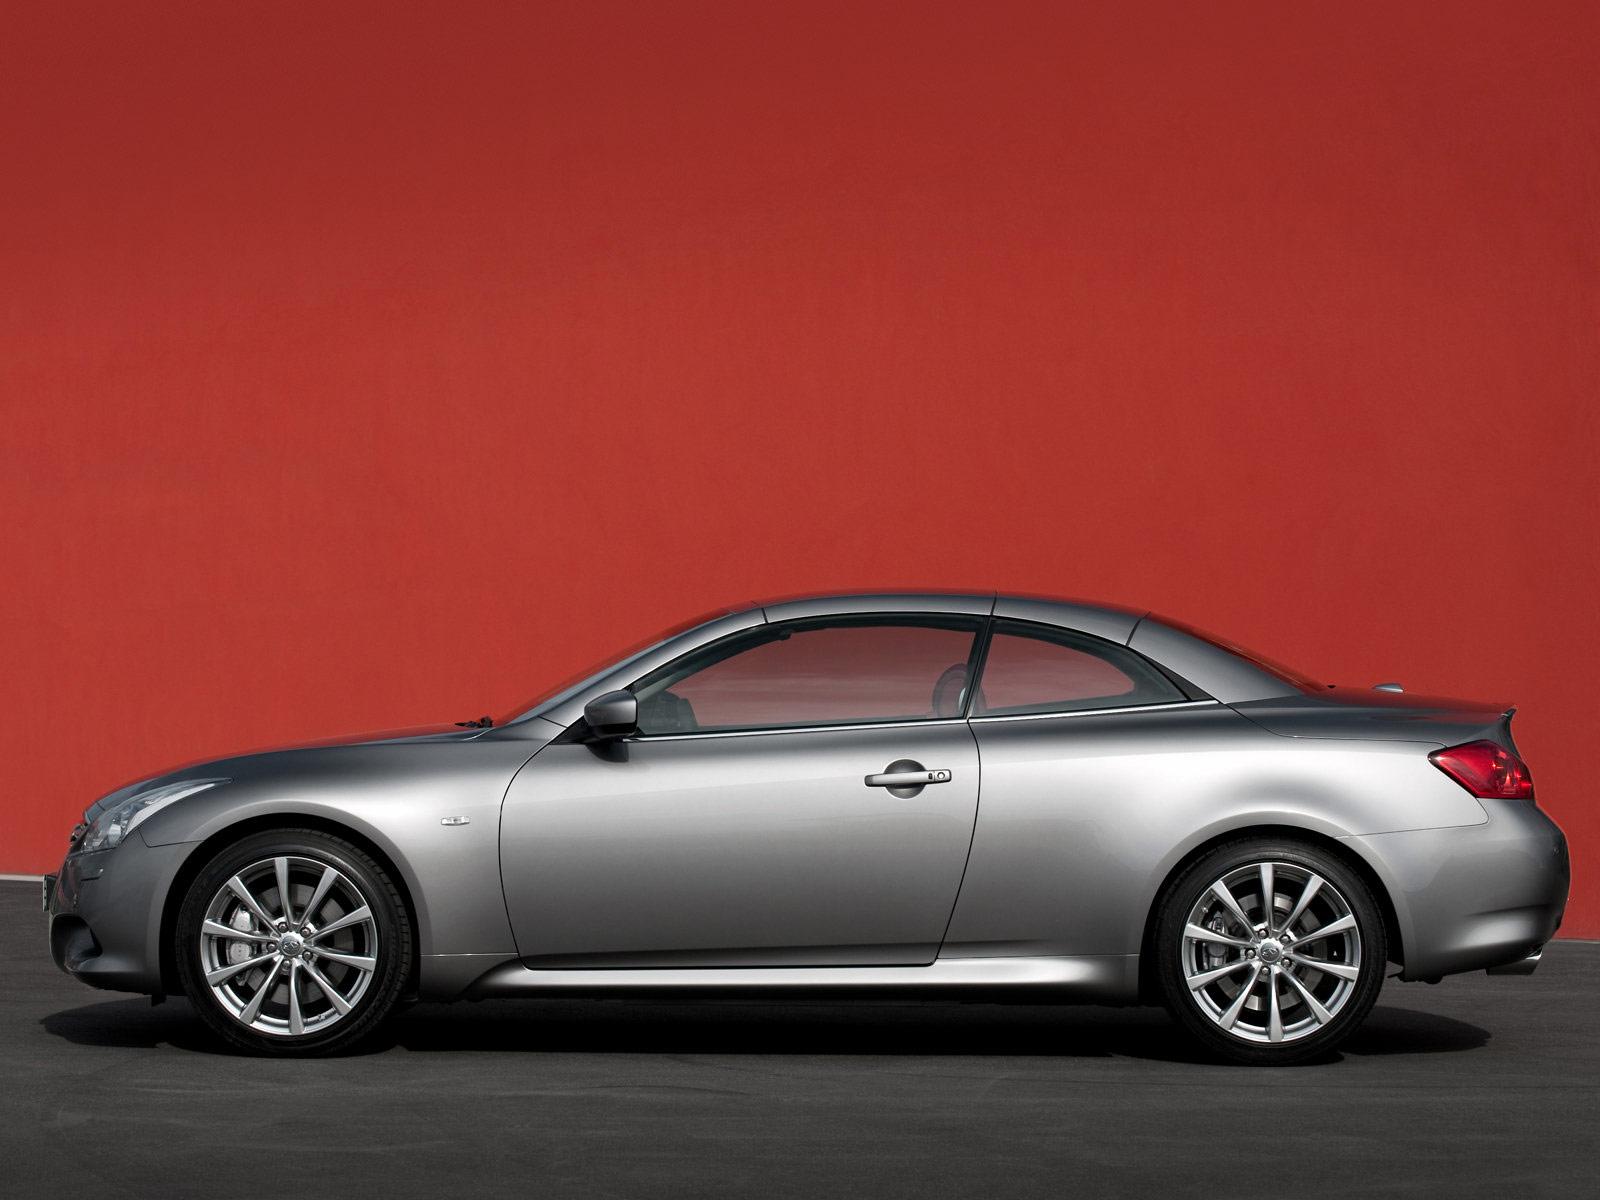 2009 infiniti g37 convertible car pictures. Black Bedroom Furniture Sets. Home Design Ideas